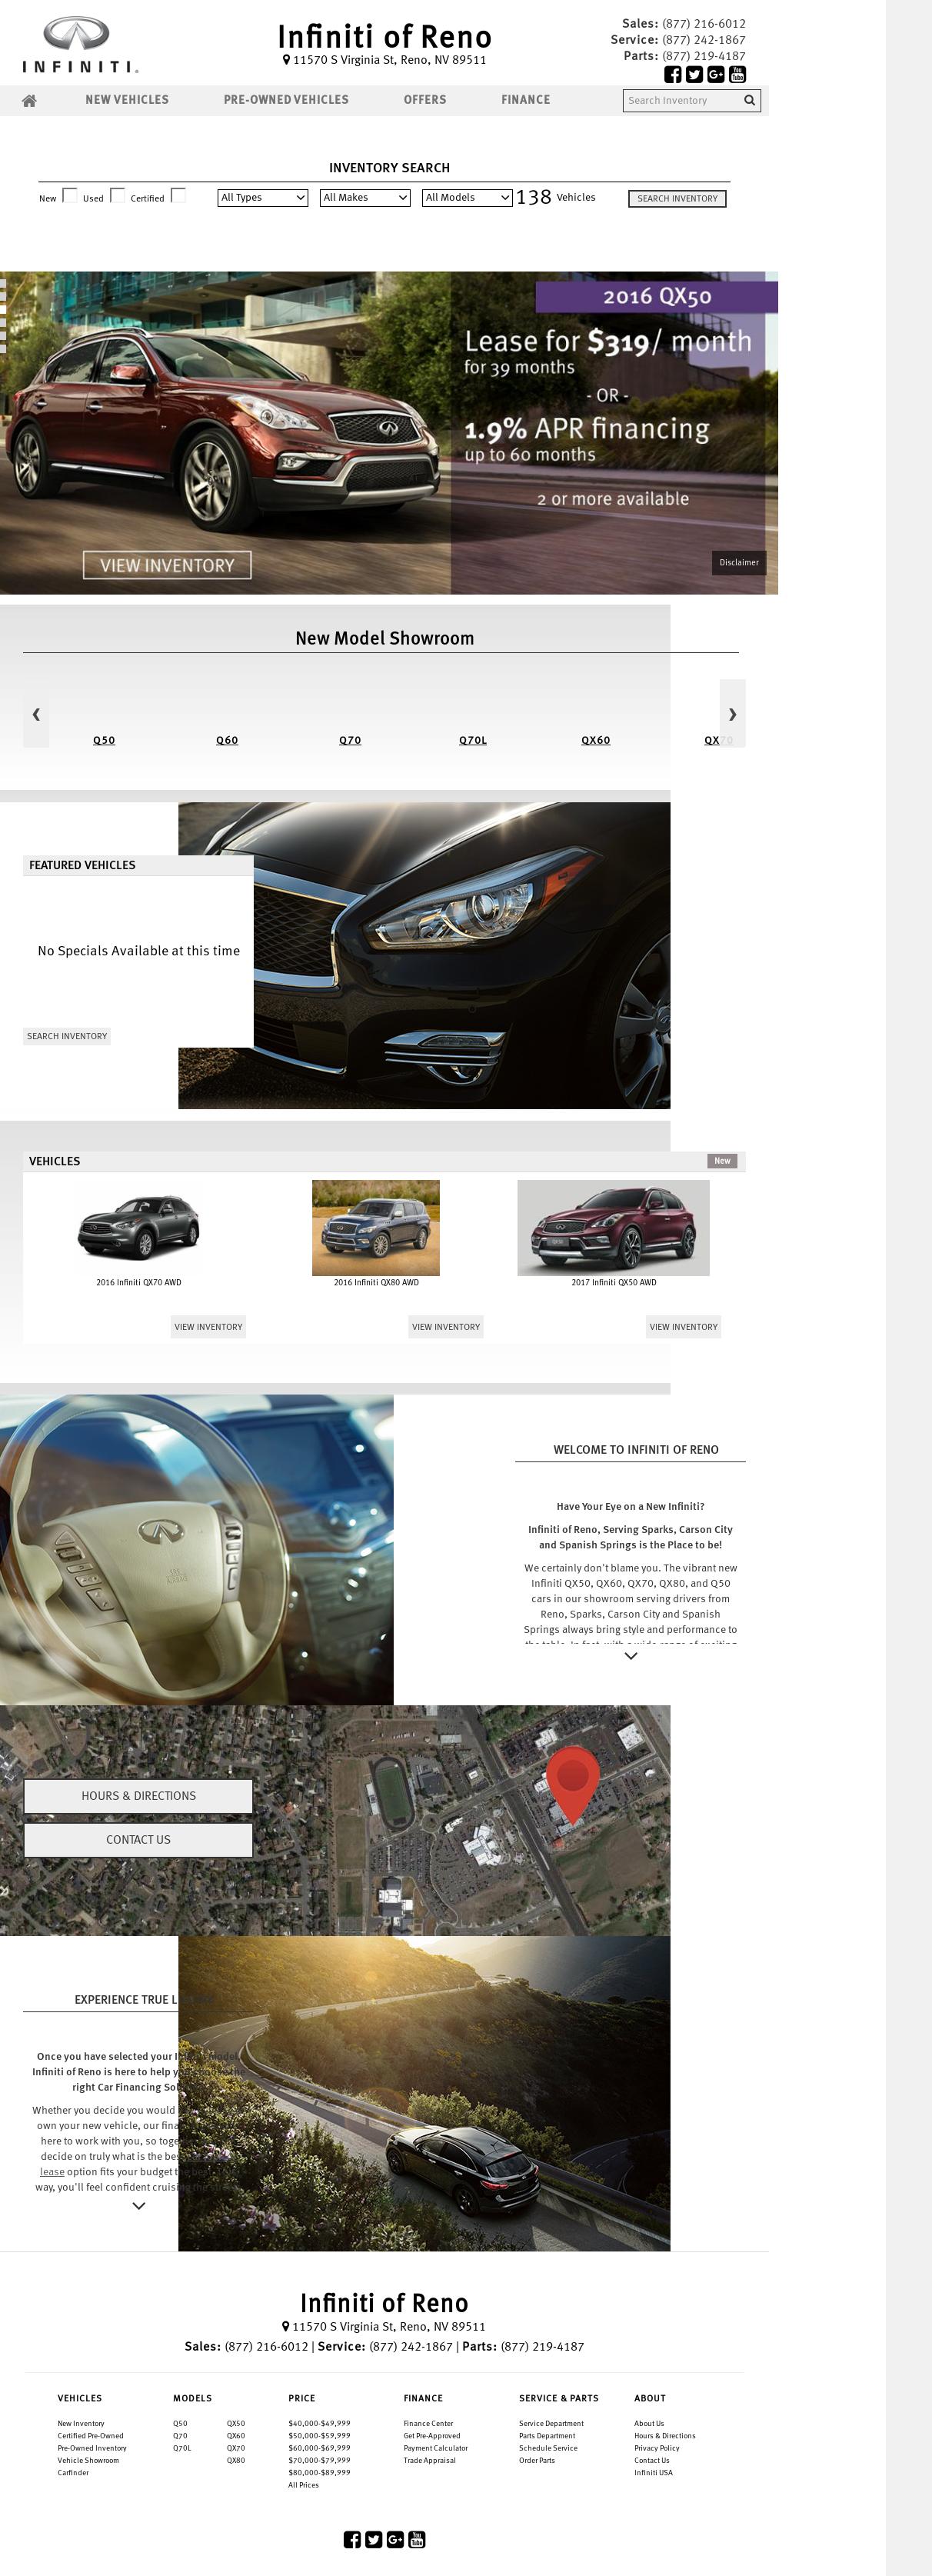 lease control infiniti pin infinity sedan hybrid interior ash wood trim japanese entertainment dash in